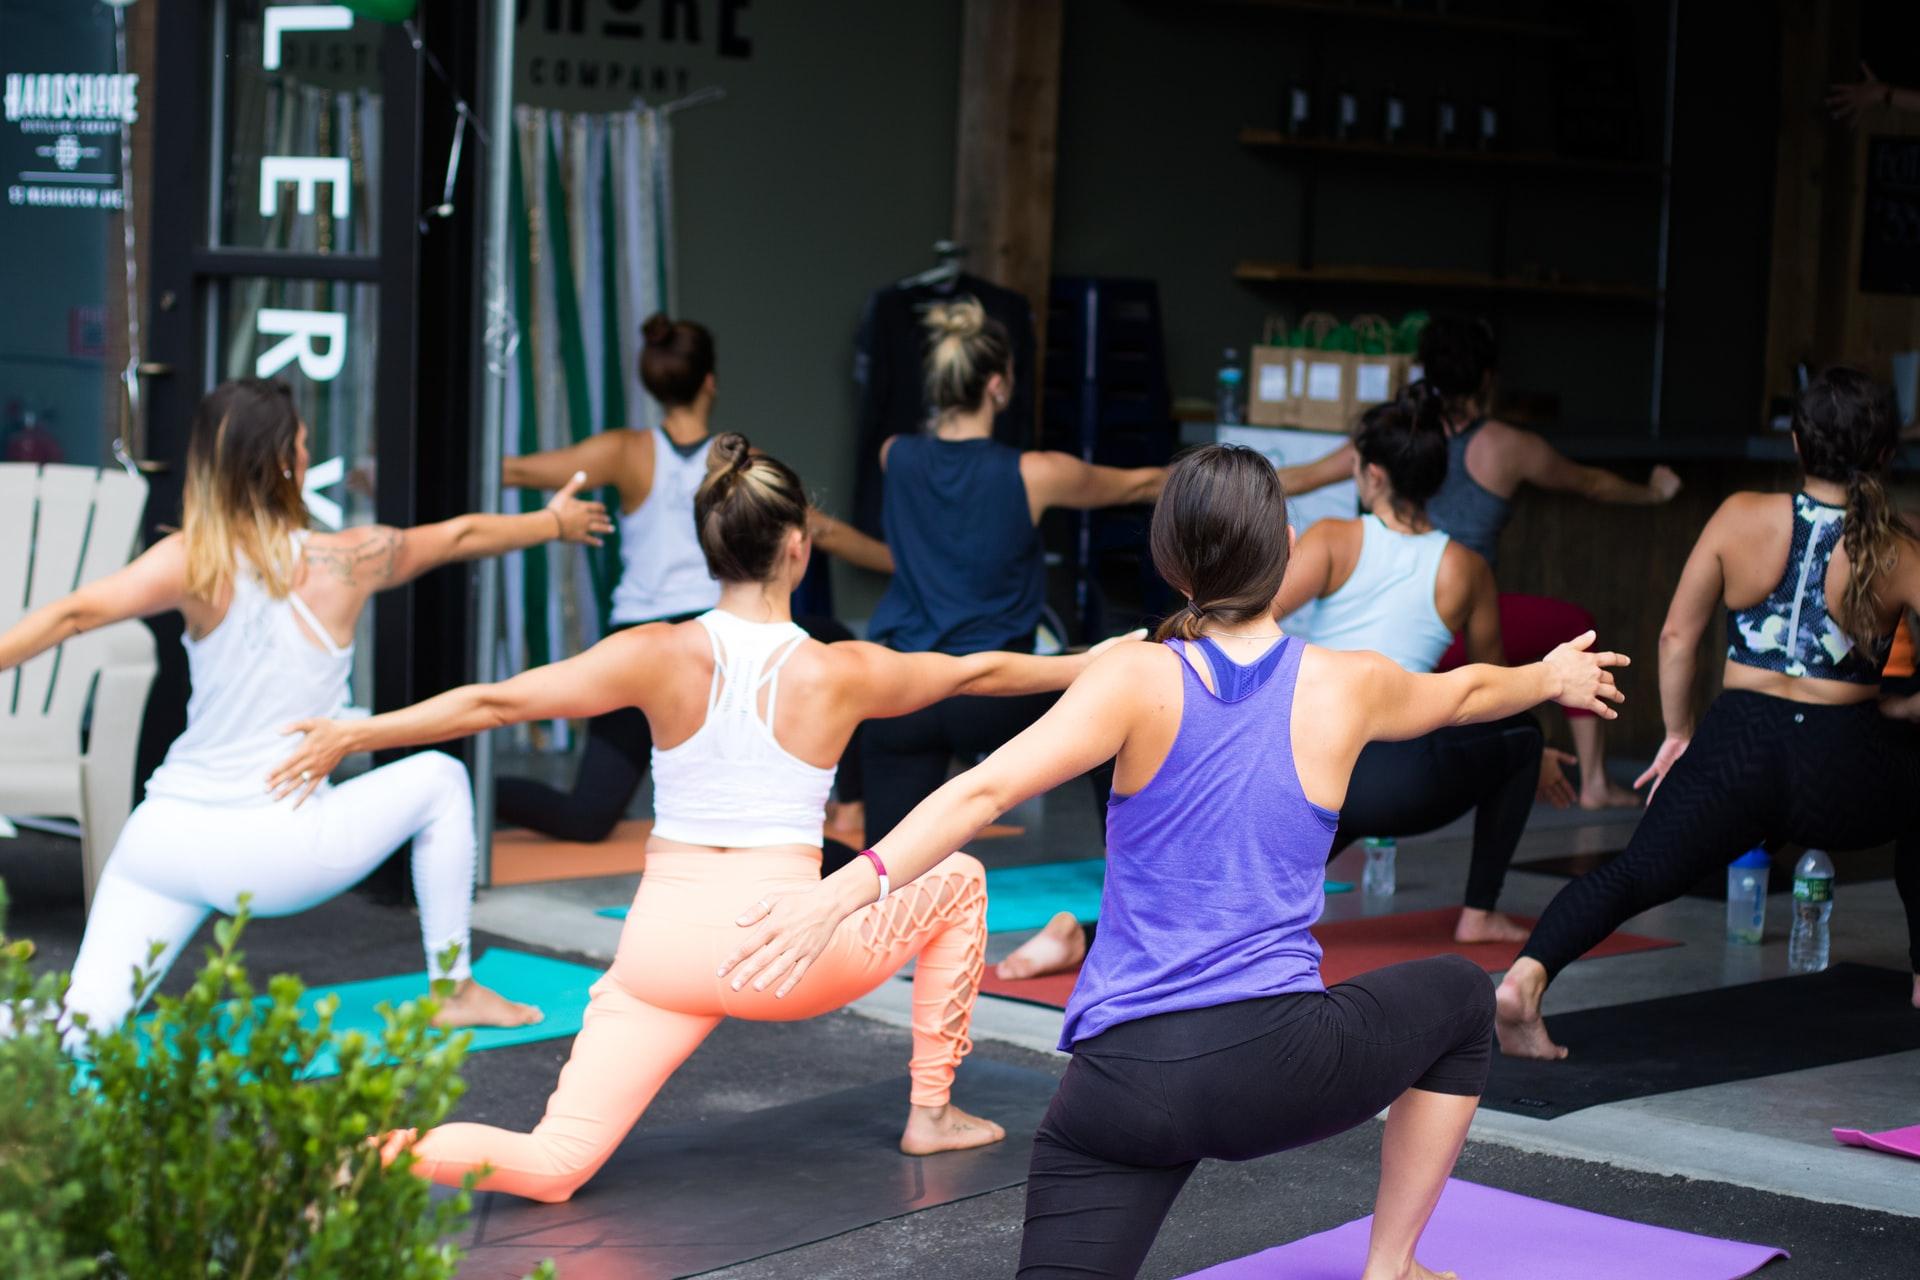 yoga studio odorizant profesional parfum ulei esential